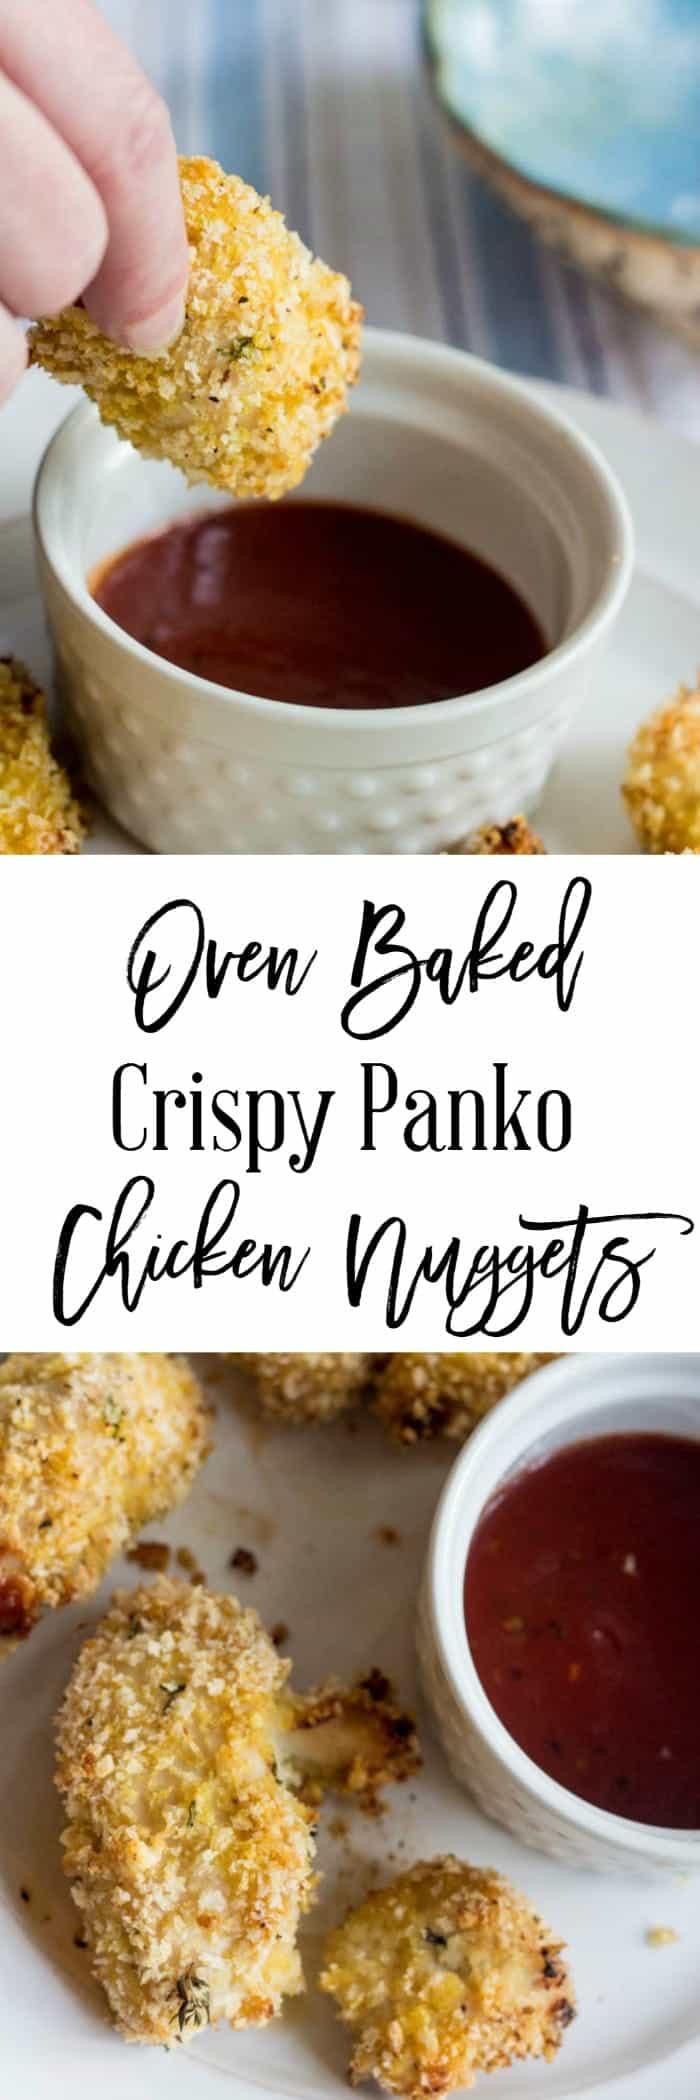 Oven Baked Crispy Panko Chicken Nuggets